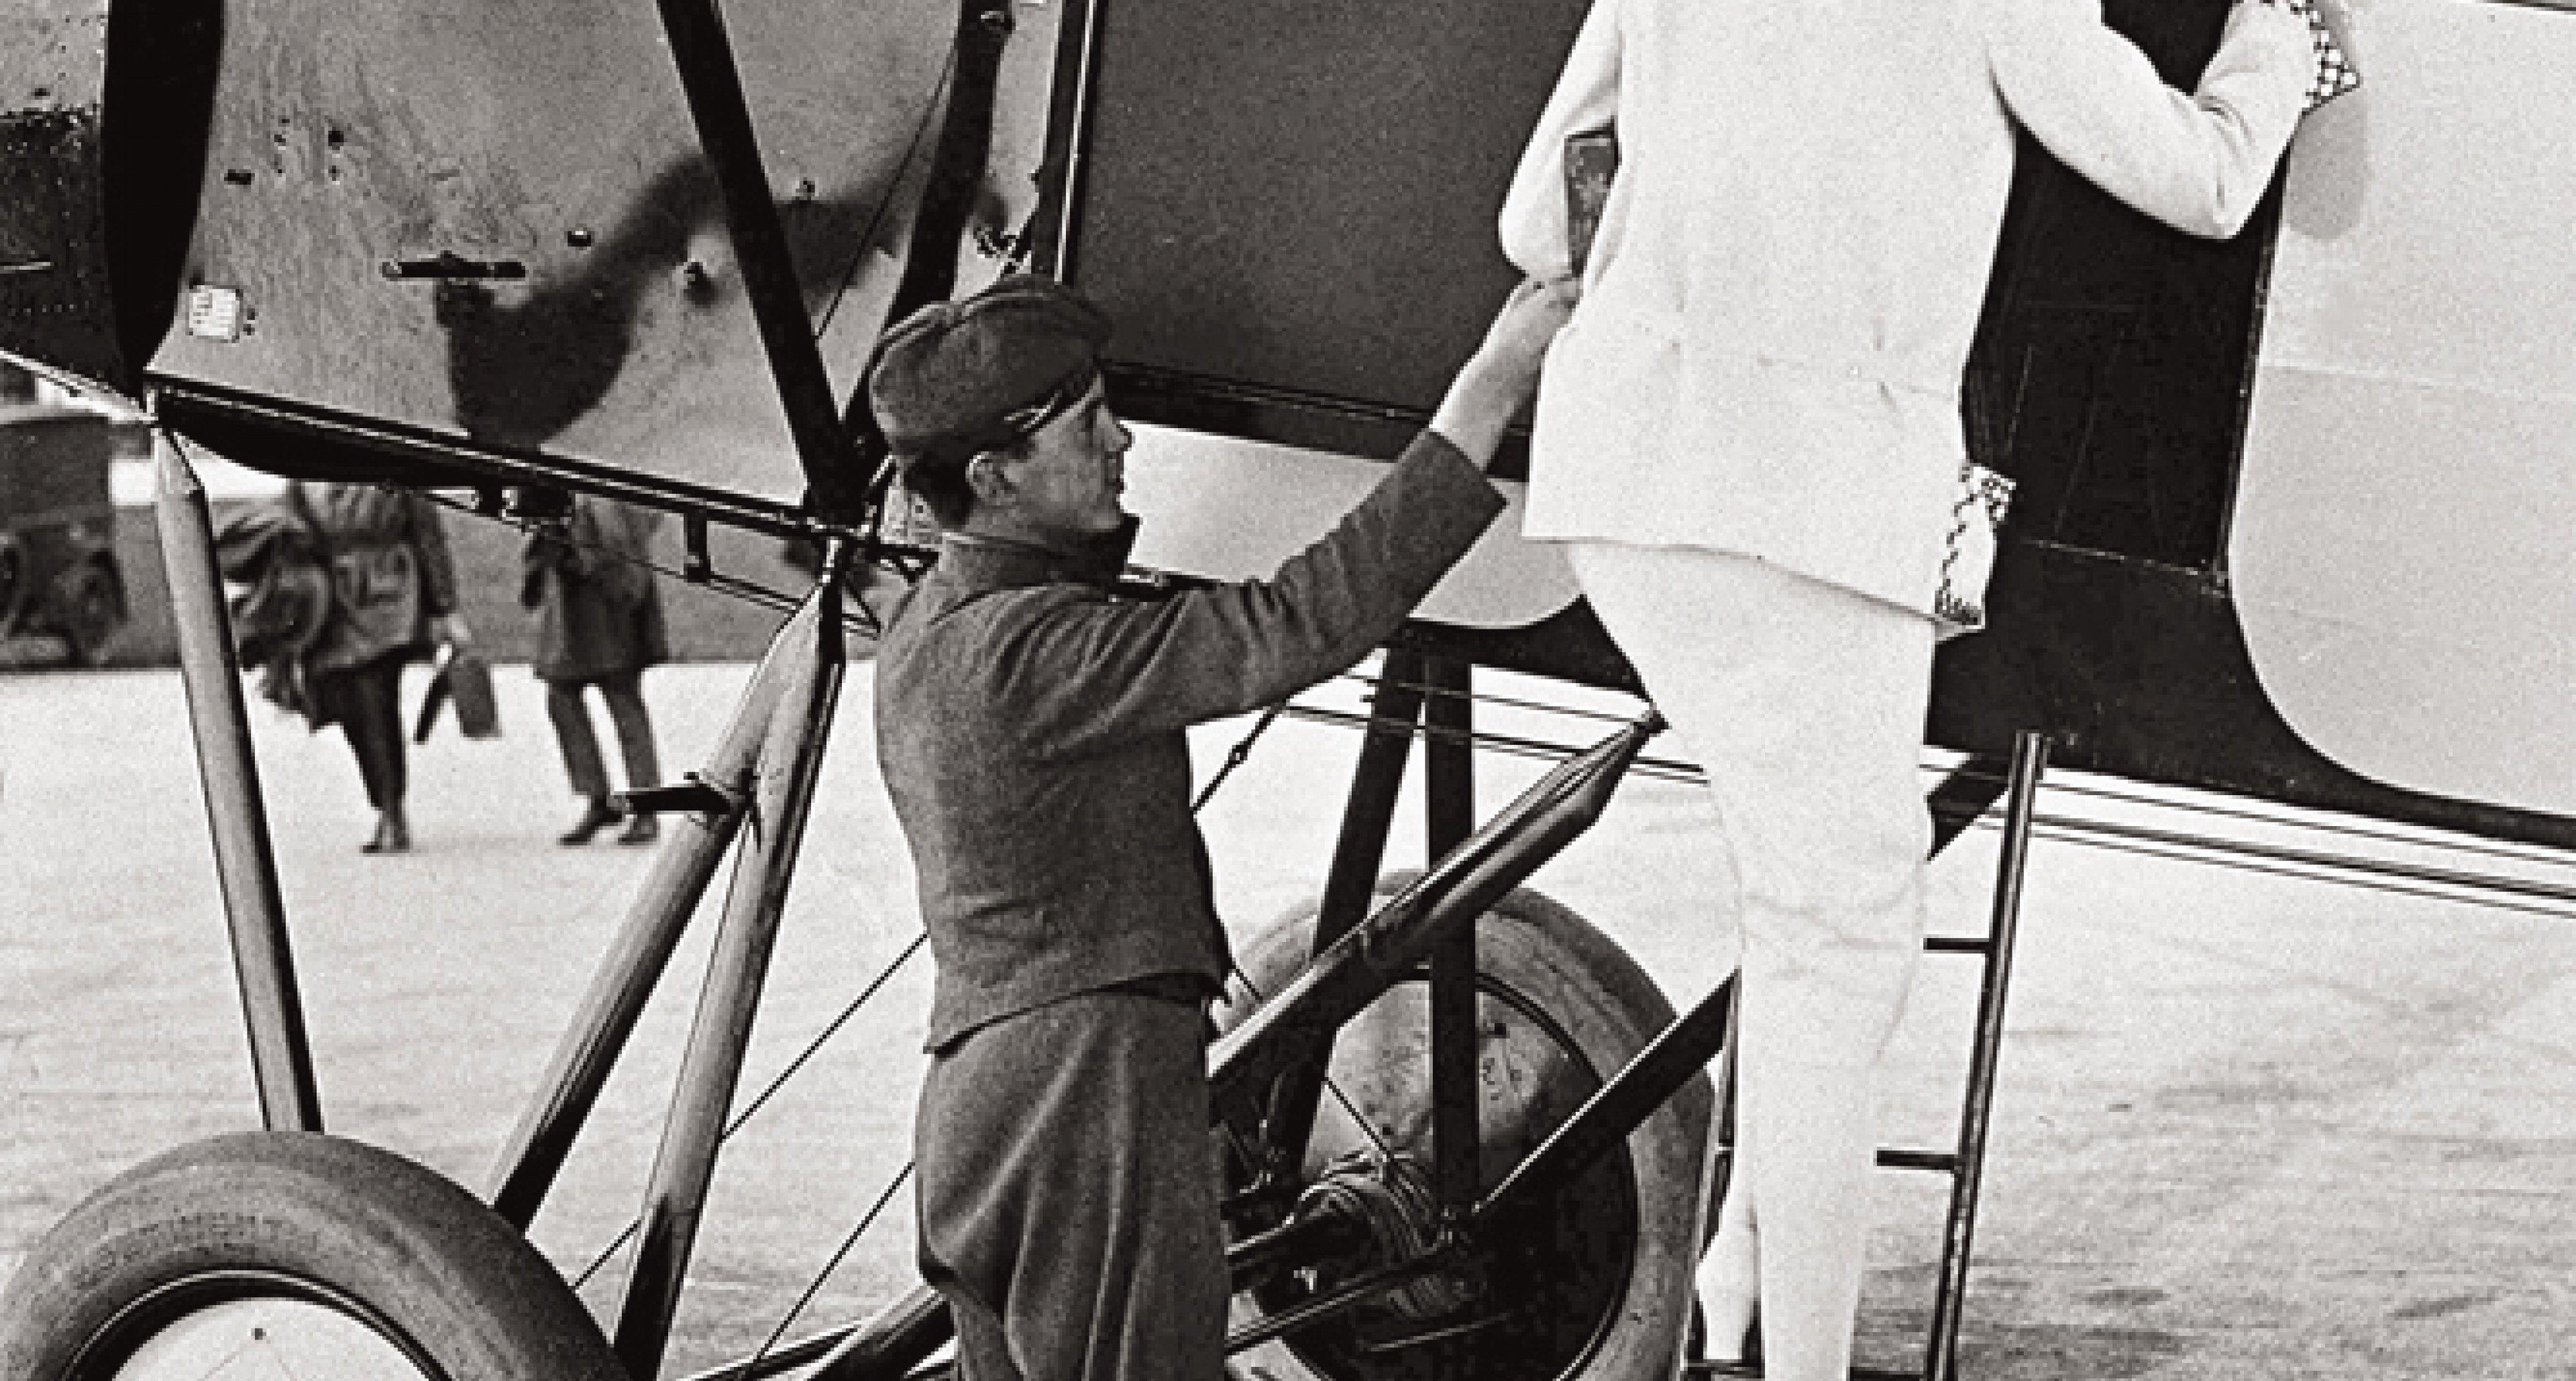 Woman boarding a Luft Hansa propeller-driven plane in 1926. © courtesy Lufthansa Archive